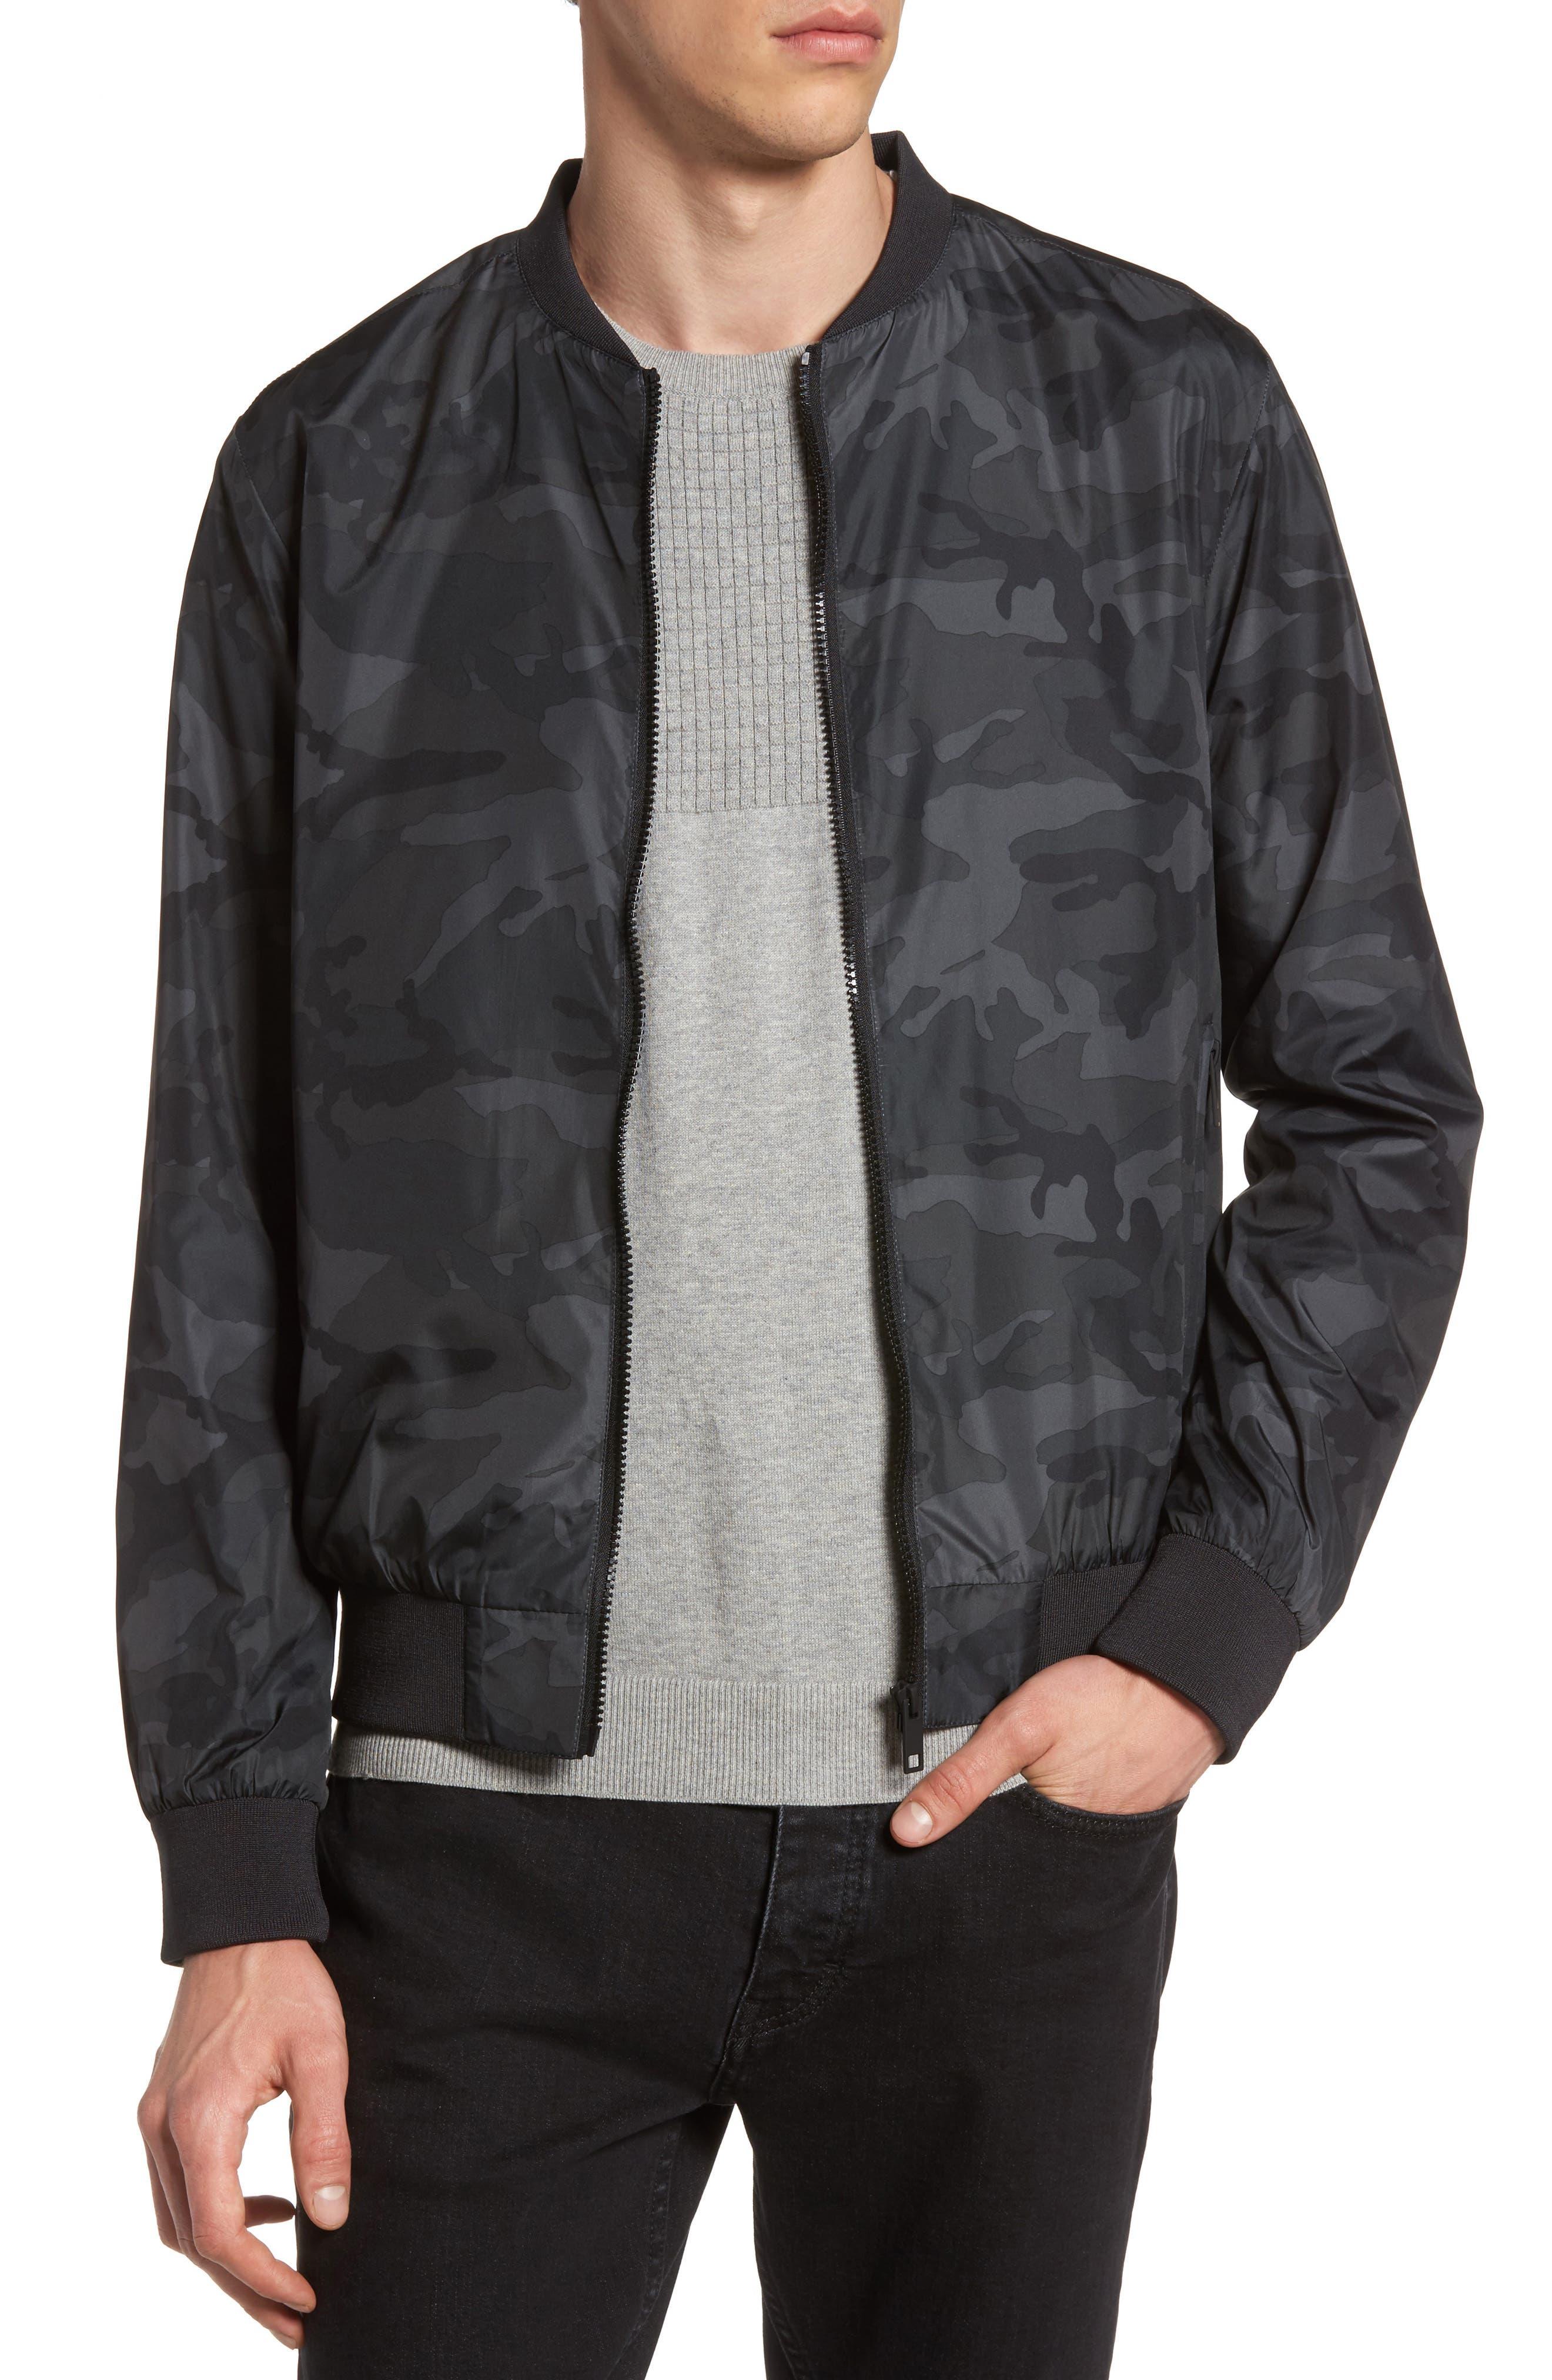 Camo Print Bomber Jacket,                         Main,                         color, Grey Multi